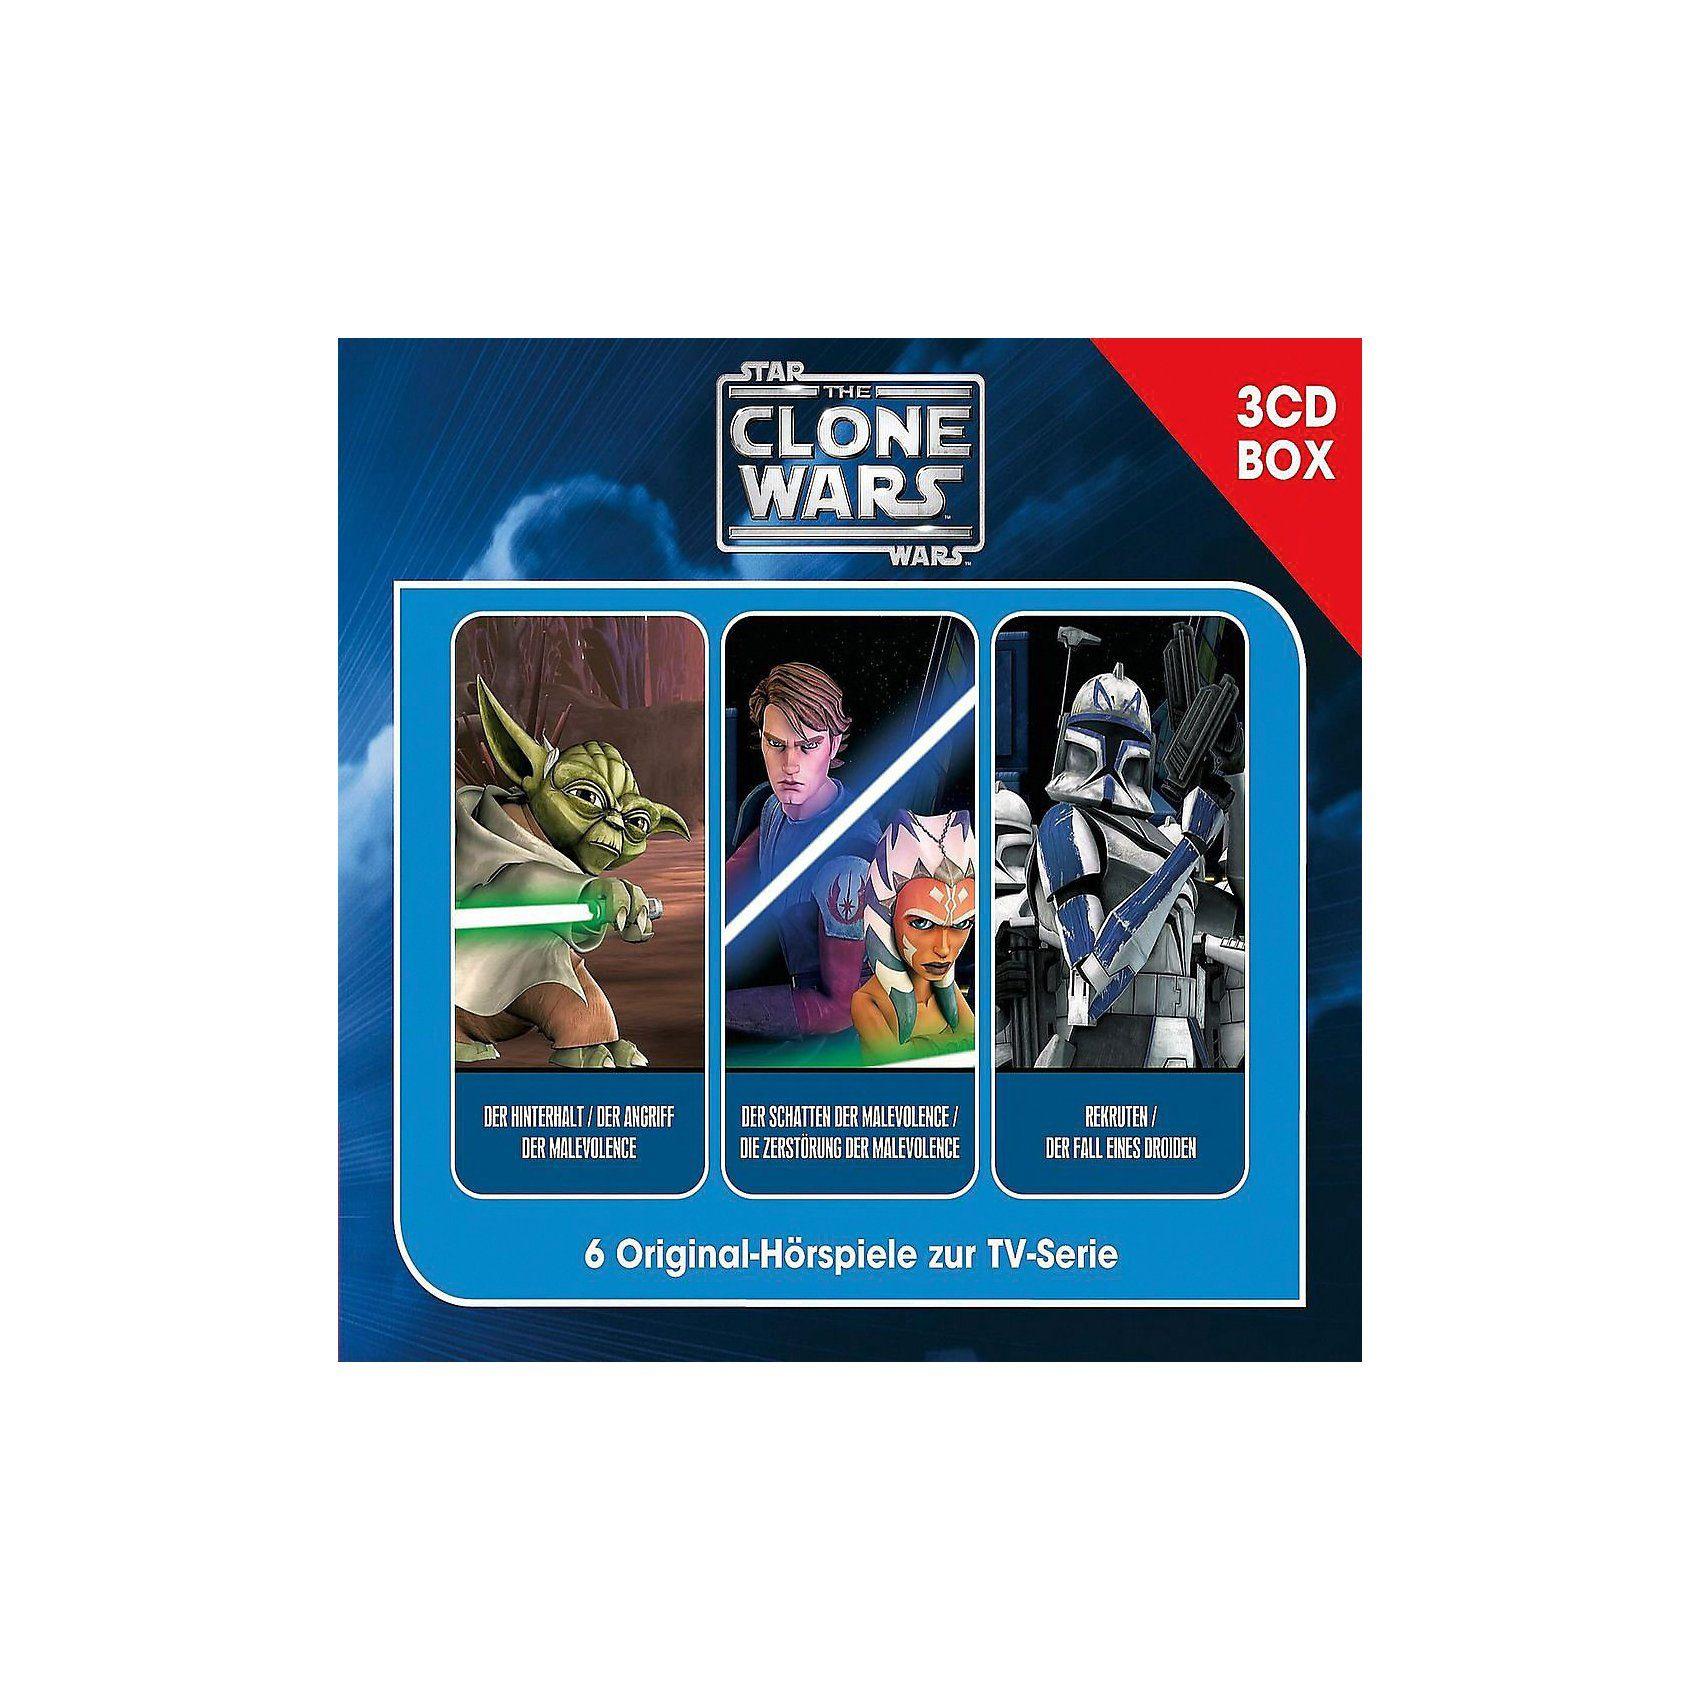 Universal CD The Clone Wars - Hörspielbox Vol. 1, 3 Audio CDs